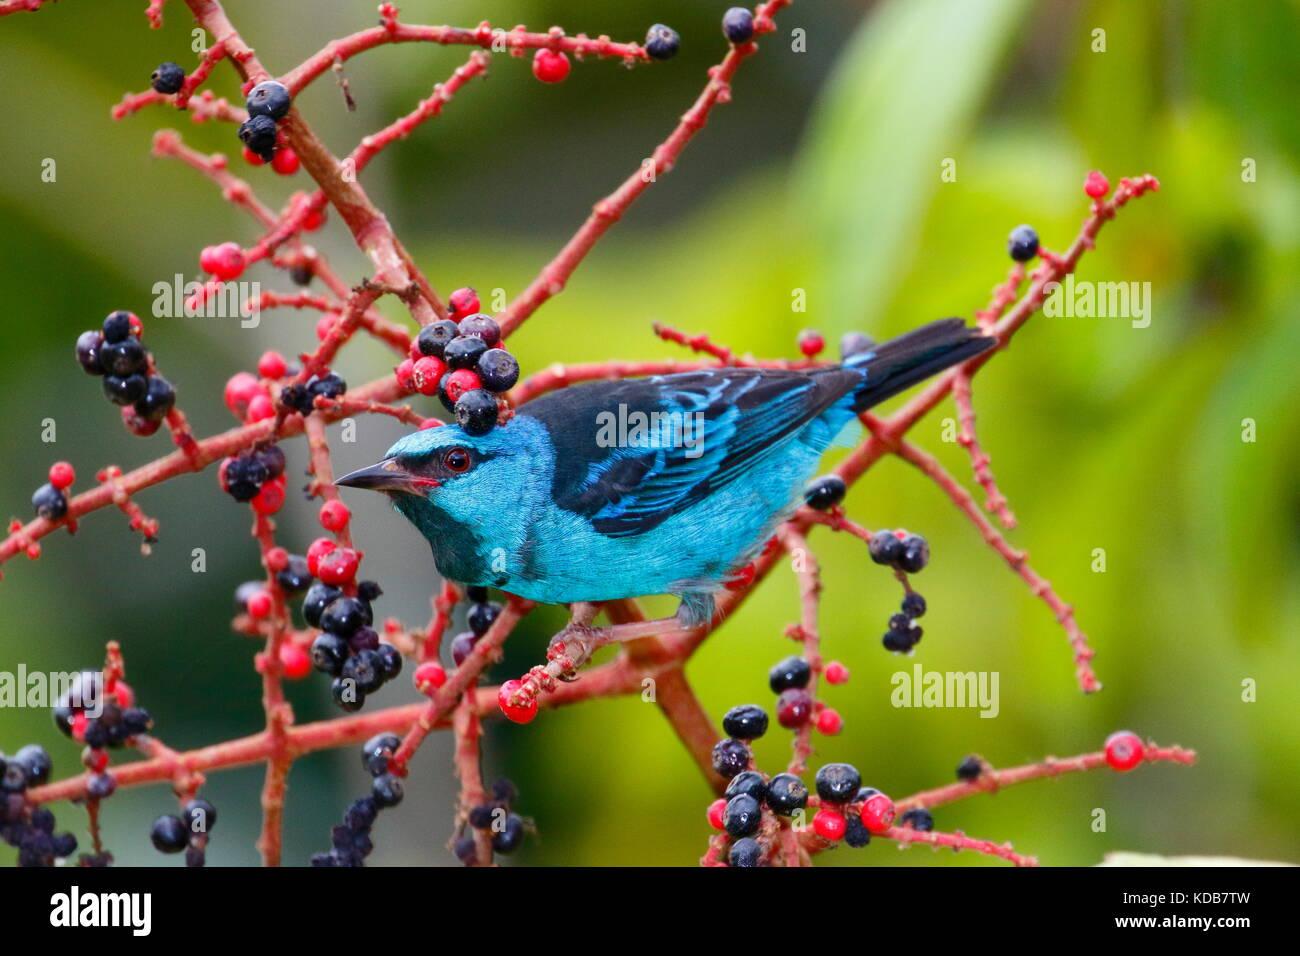 Un dacnis blu o turchese honeycreeper, Dacnis cayana, rovistando su melastome frutta. Immagini Stock